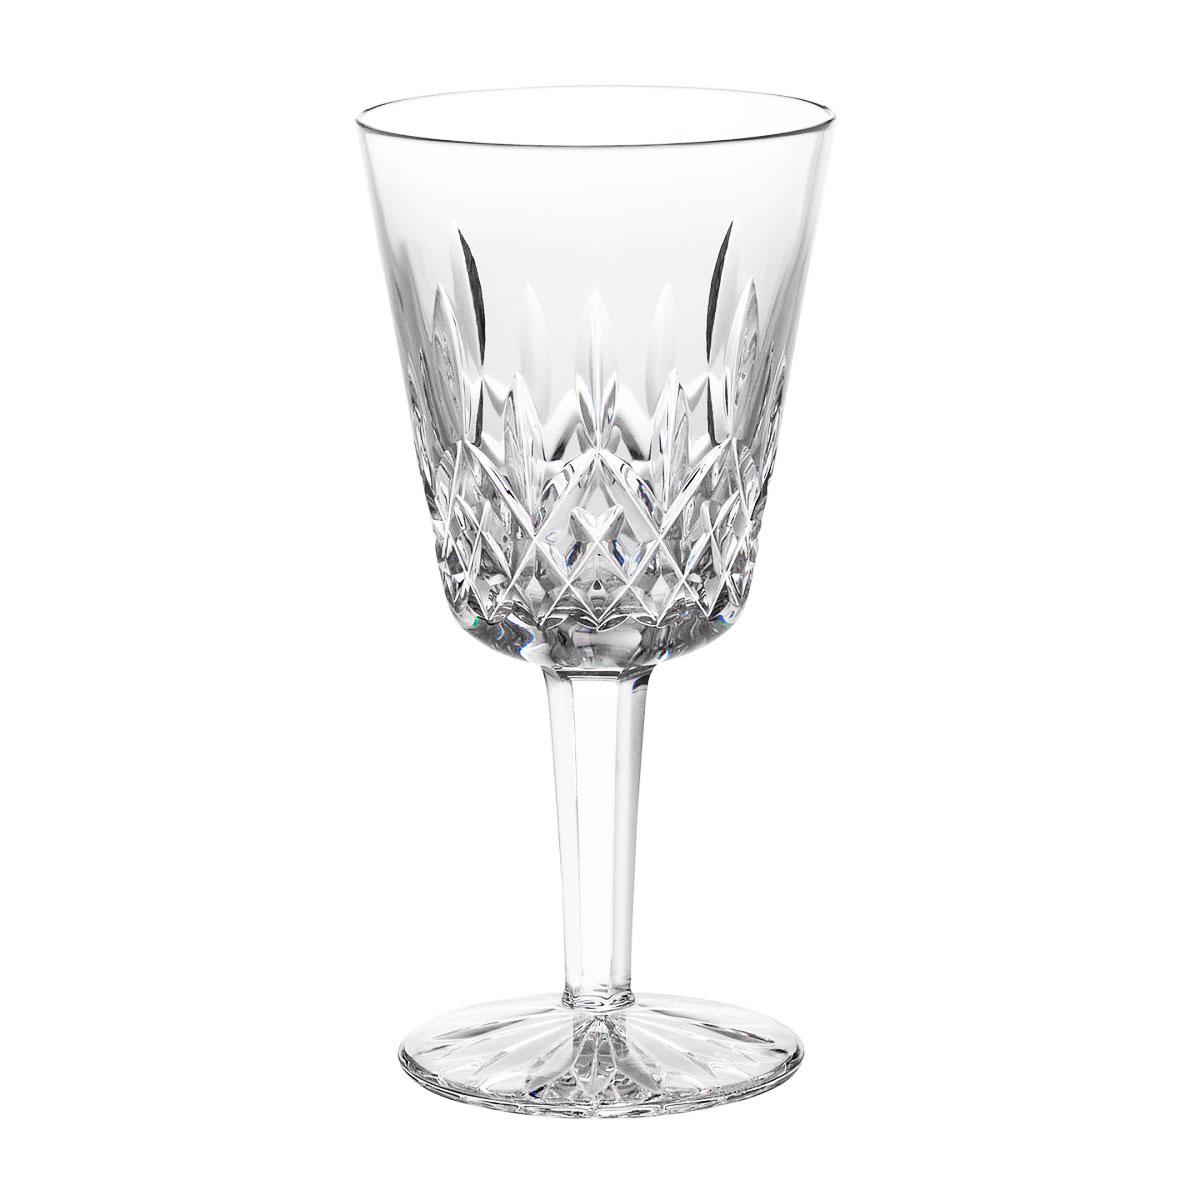 Waterford Crystal Lismore Goblet, Single